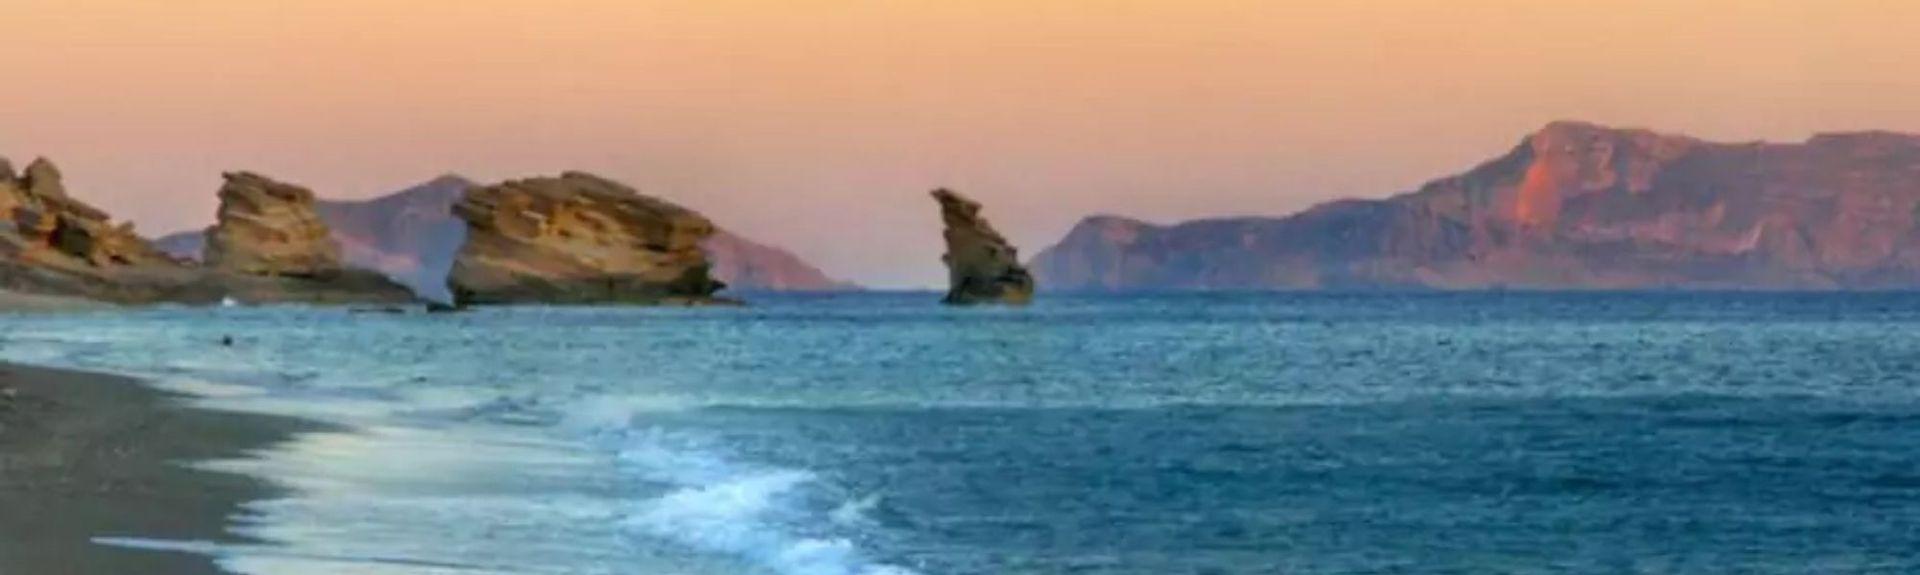 Lefkogeia, Agios Vasileios, Isla de Creta, Grecia